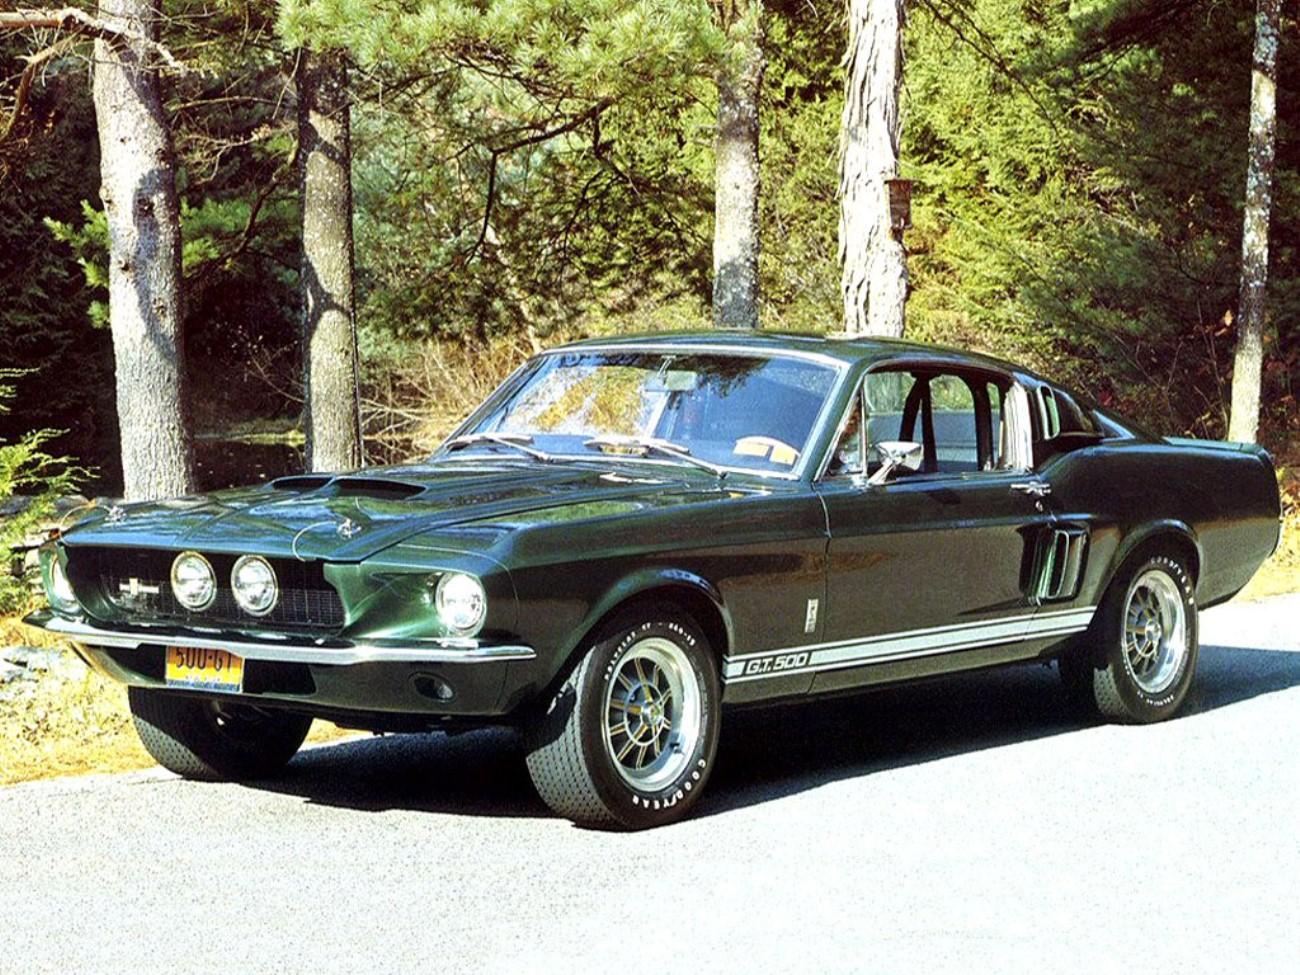 Ford Mustang 1967 Wallpaper Phone